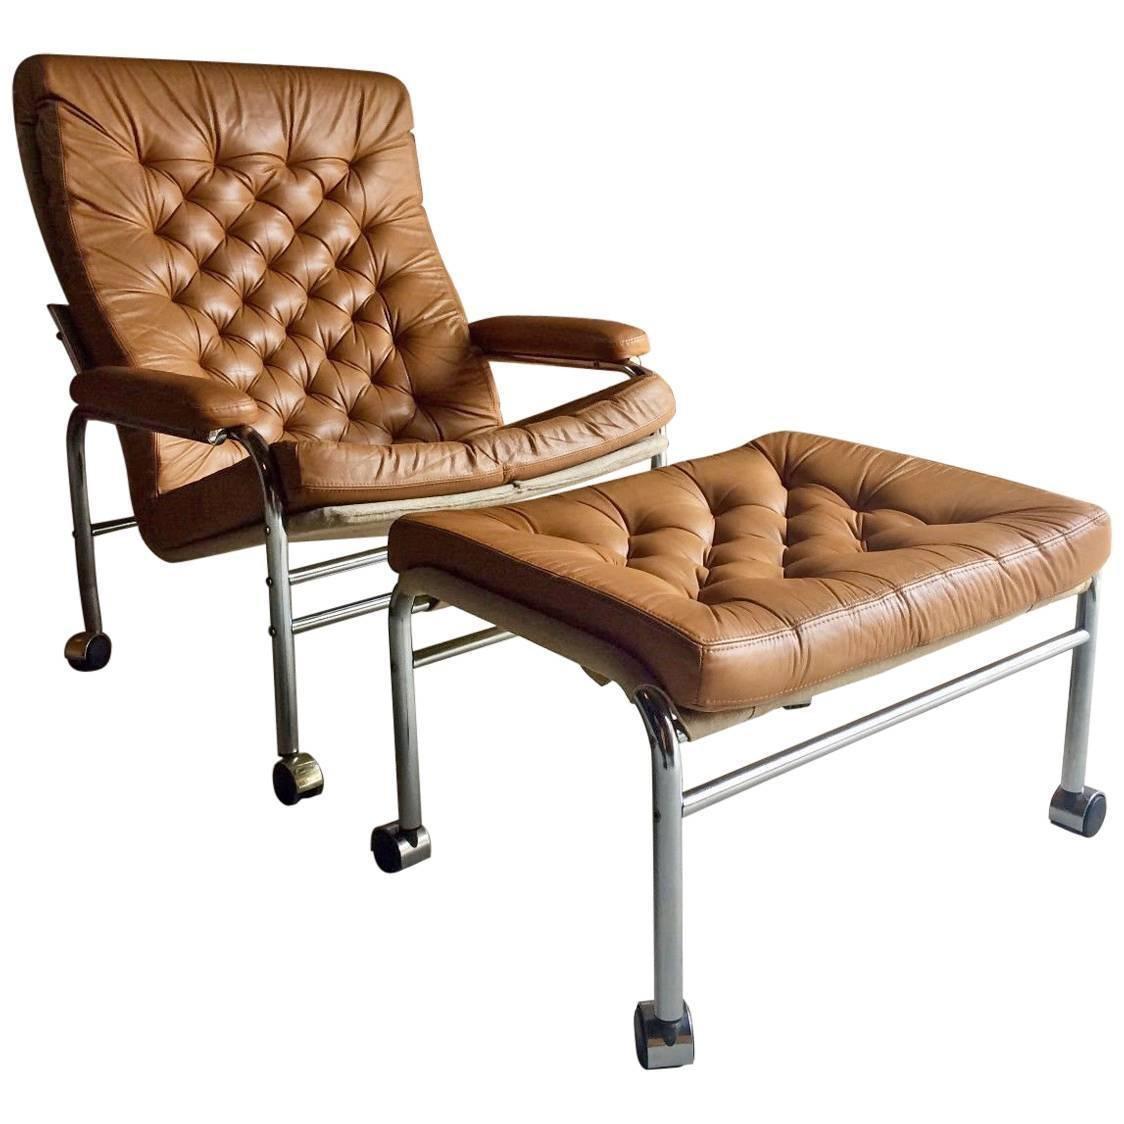 Bore Lounge Chair U0026 Footstool By Noboru Nakamura For Ikea, 1970s